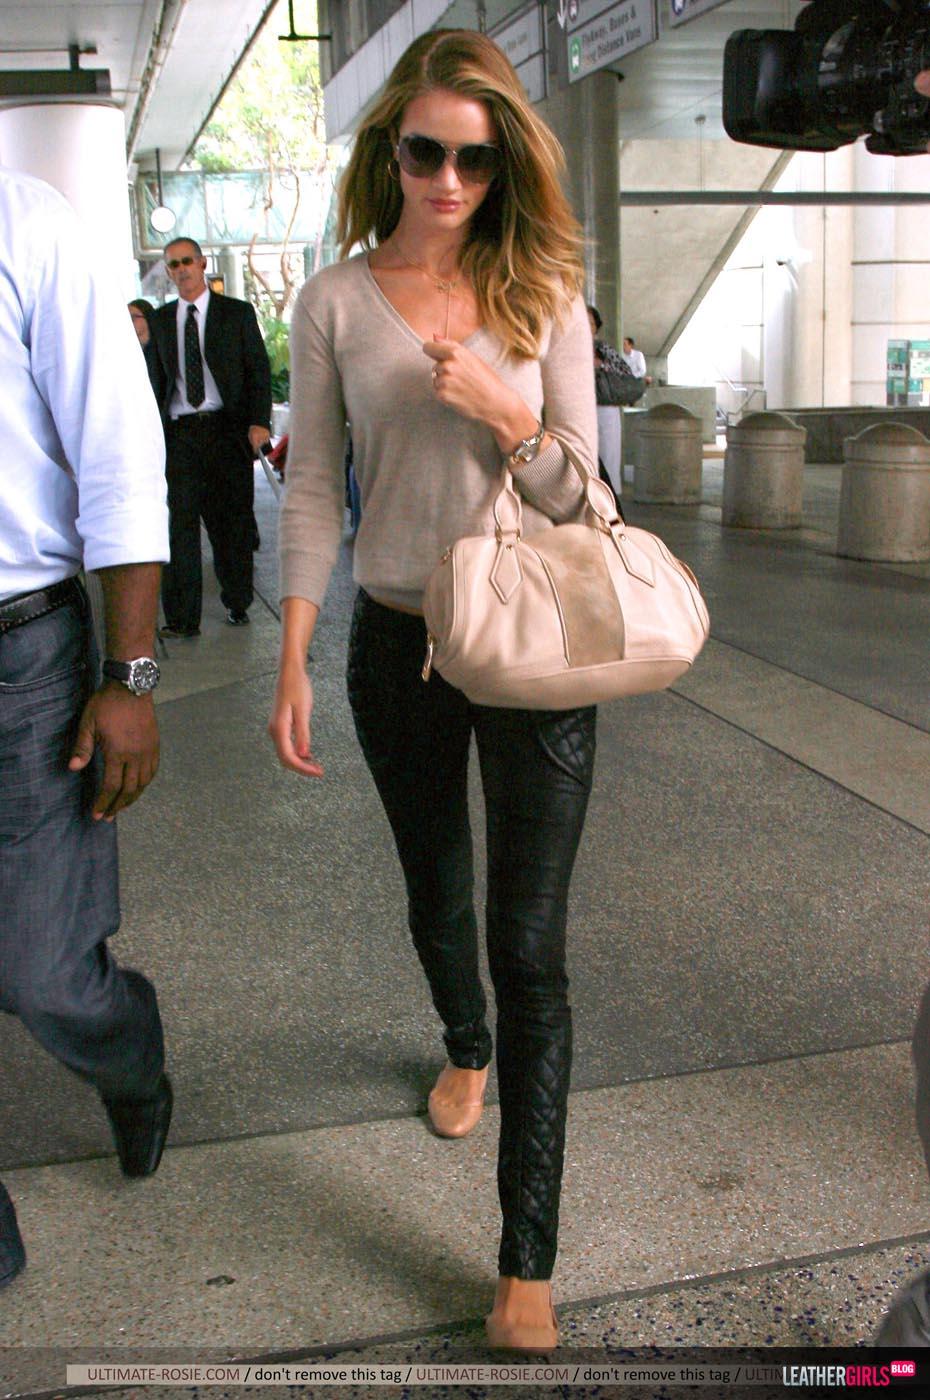 Rosie Huntington-Whiteley was spotted arriving back in LA leathergirlsblog-com- (4).jpg